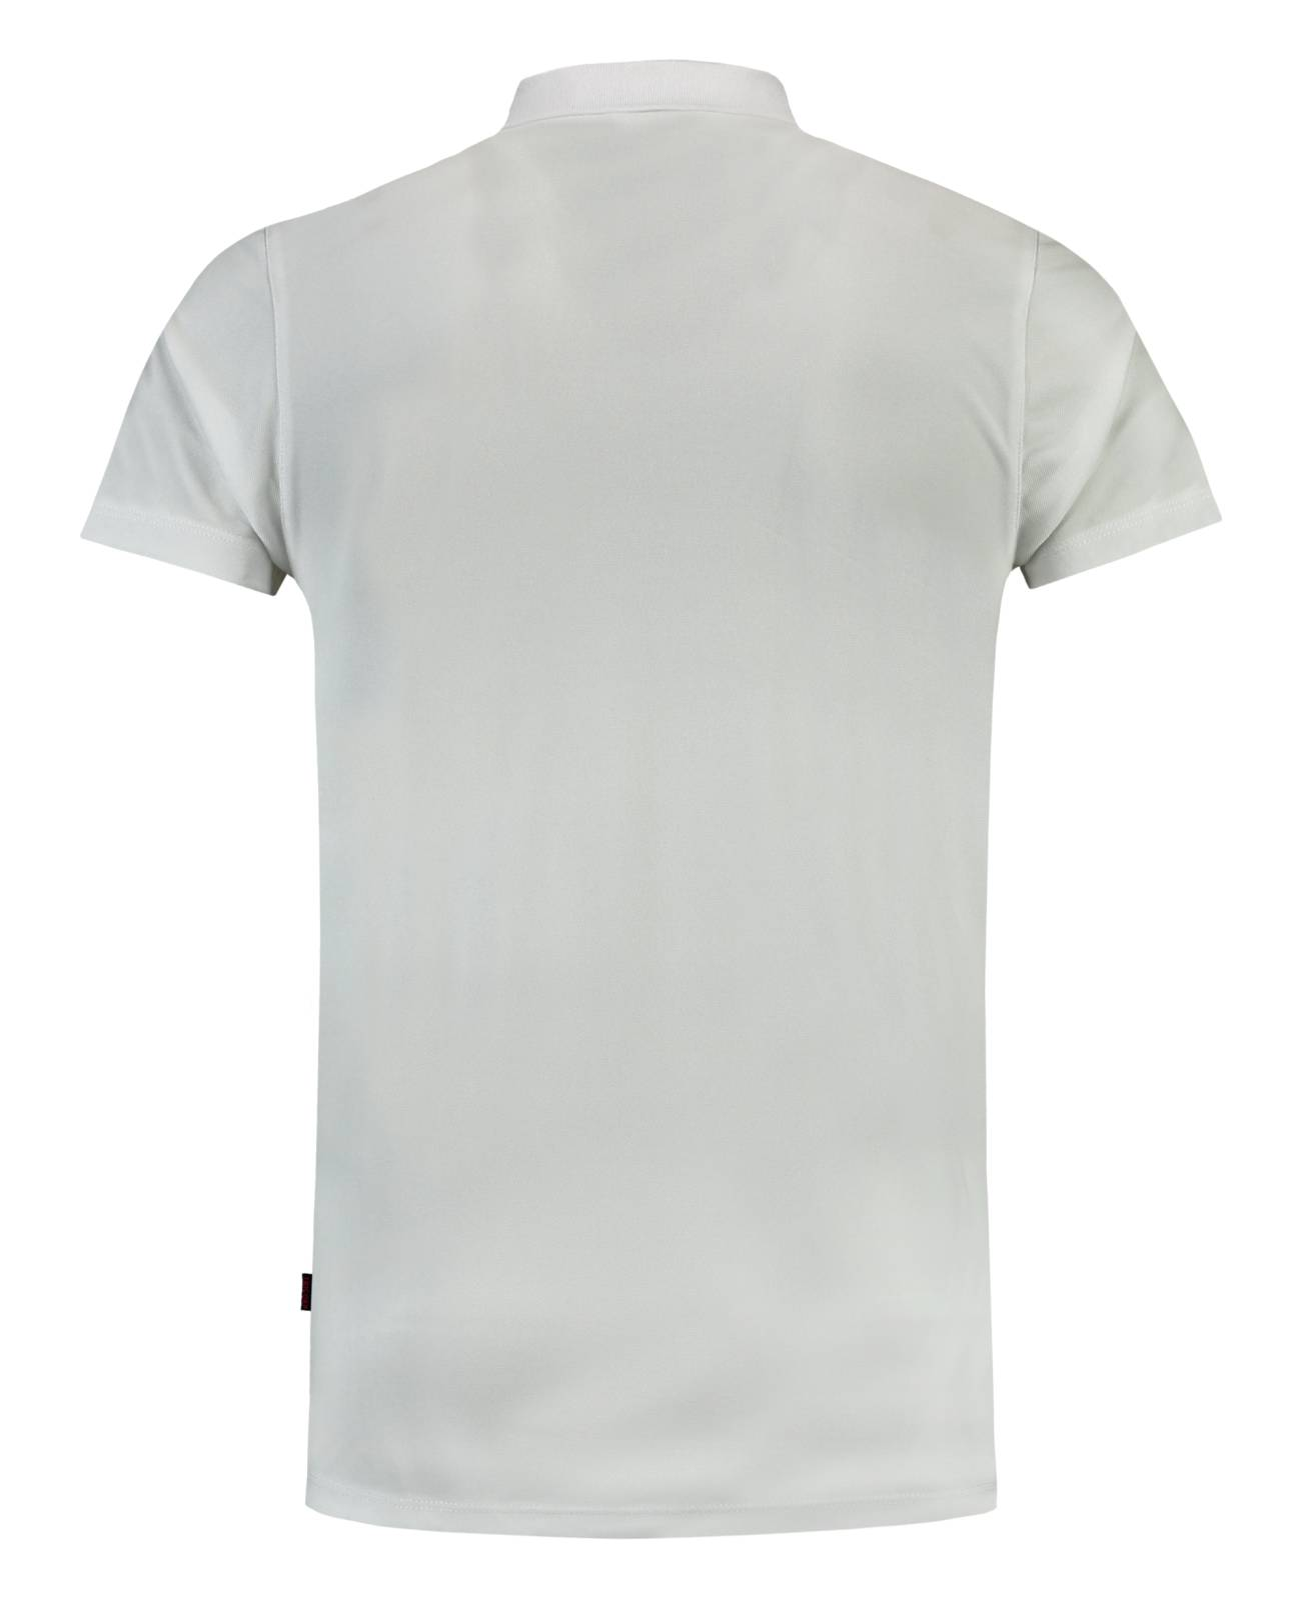 Tricorp Casual Poloshirts 201001-PBA180 wit(White)